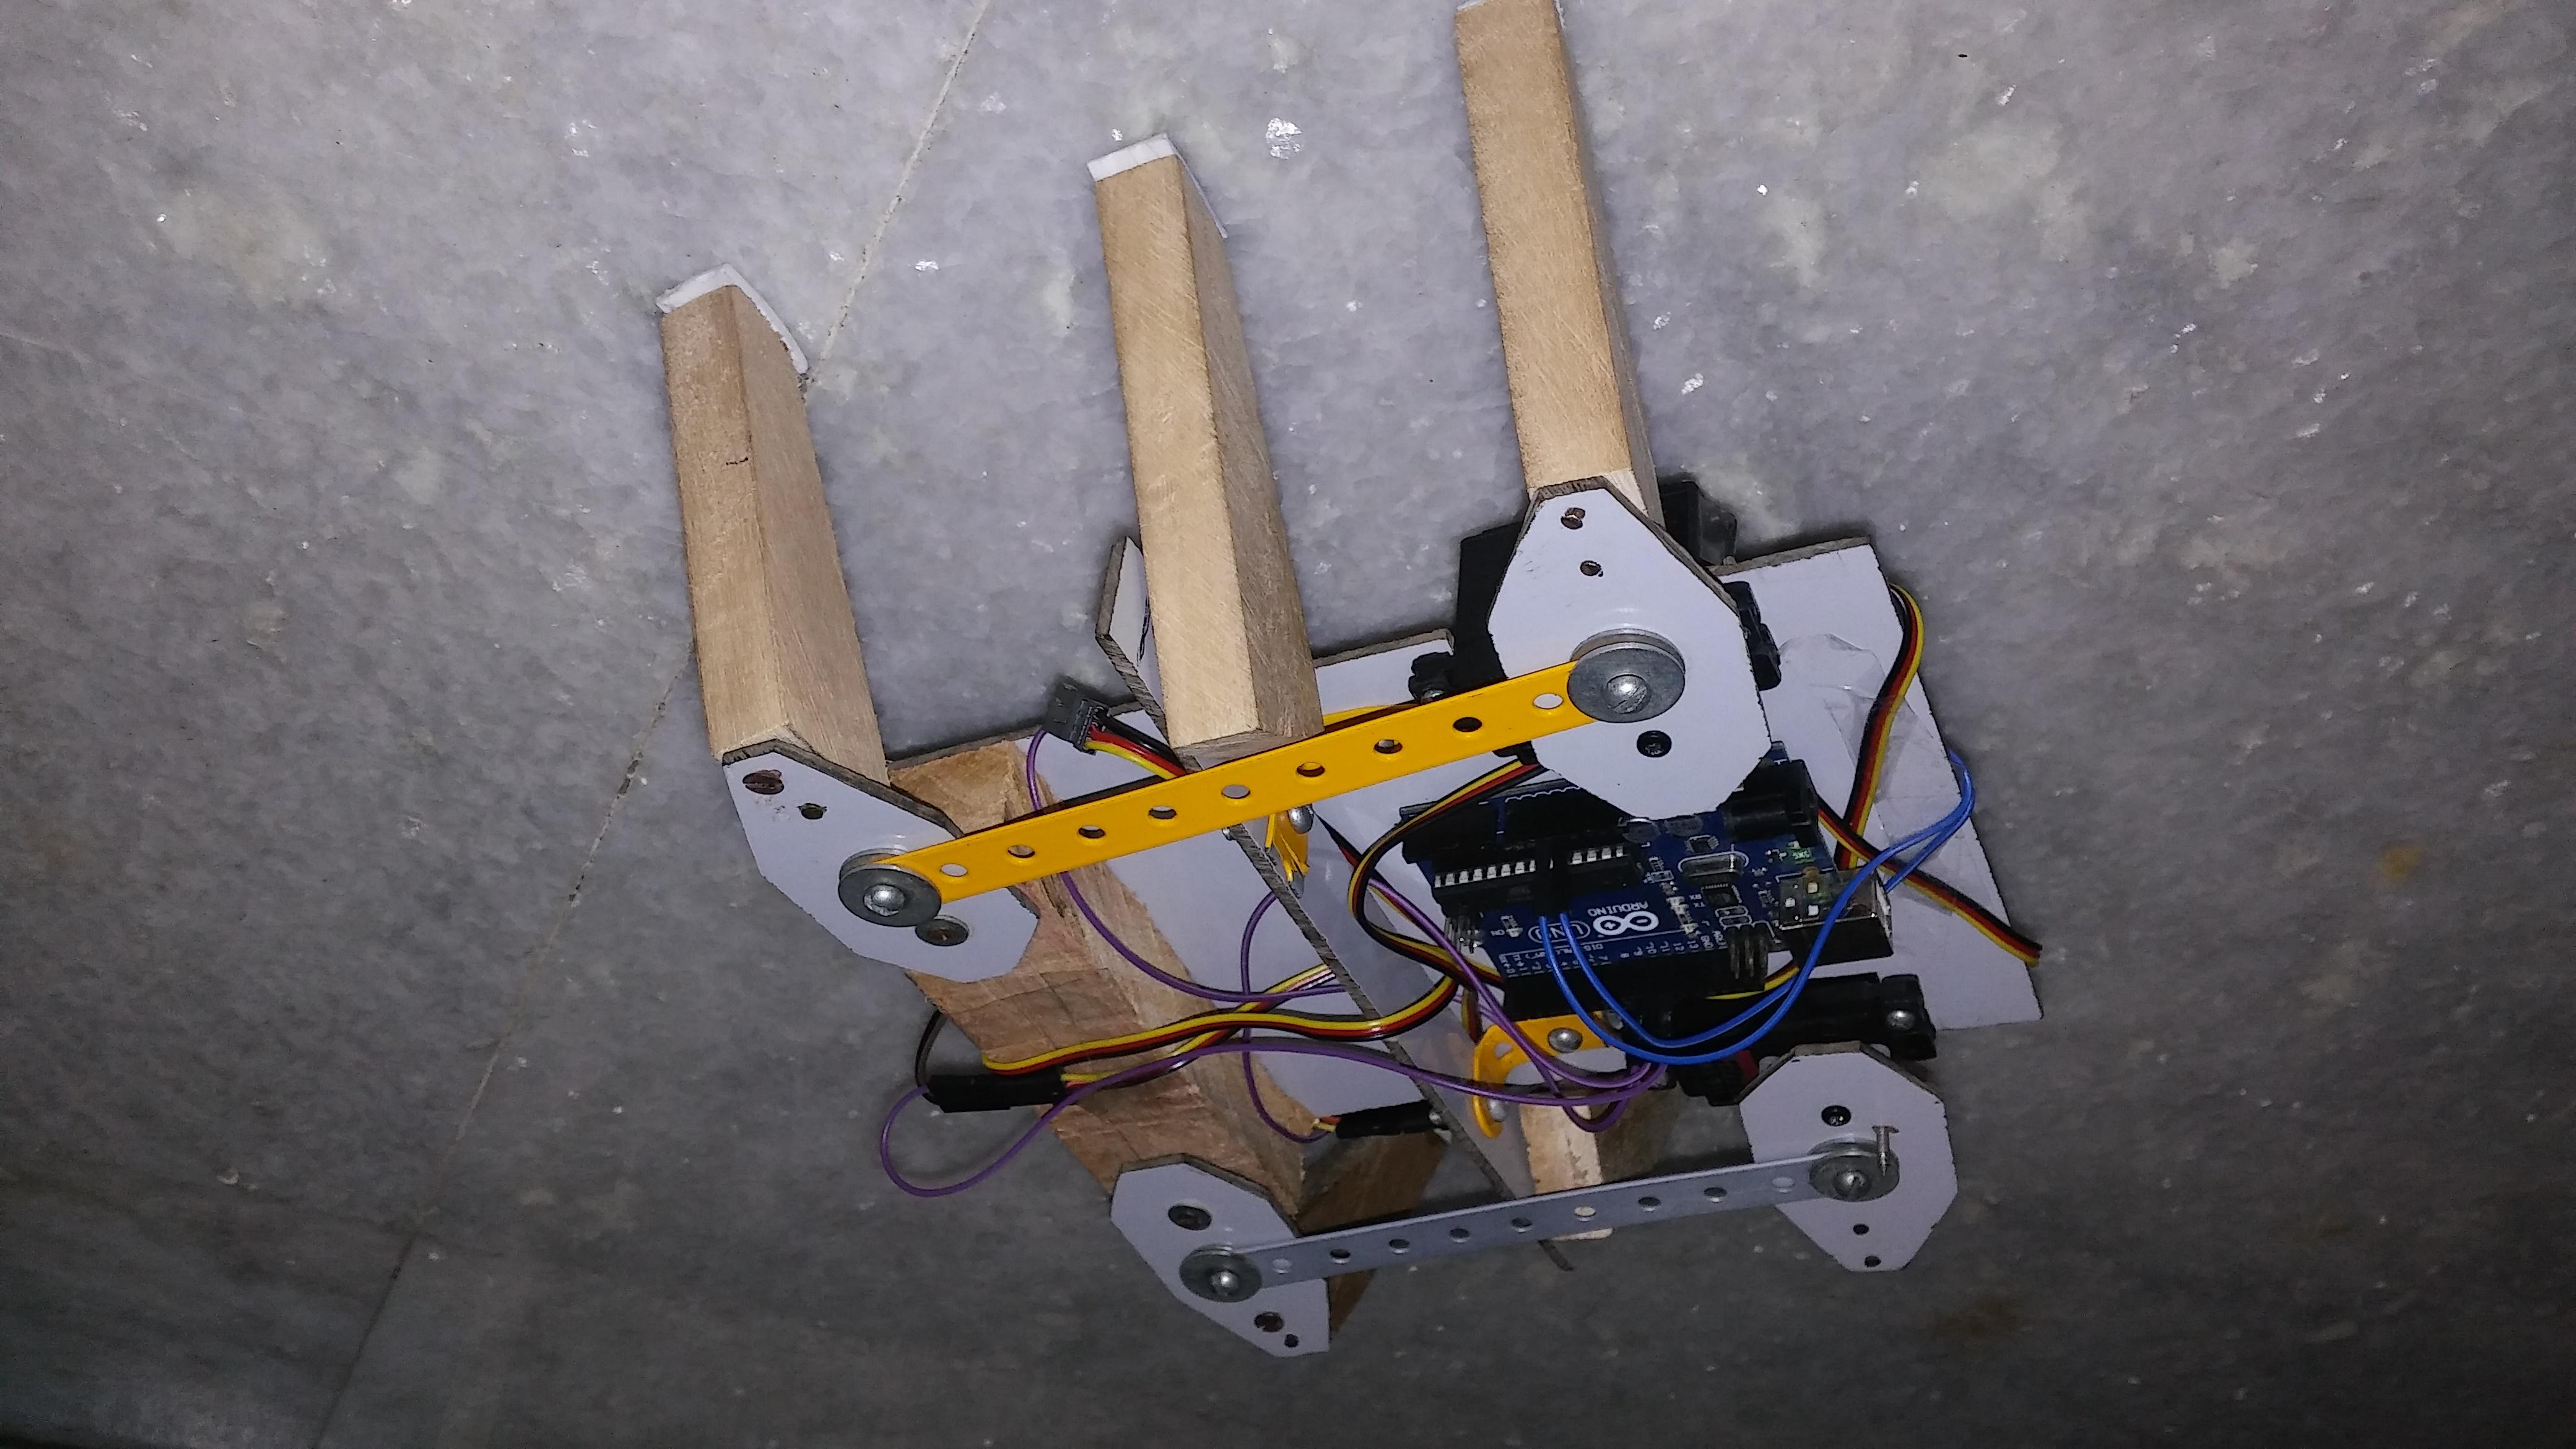 Hexapod (robotics) - Wikipedia